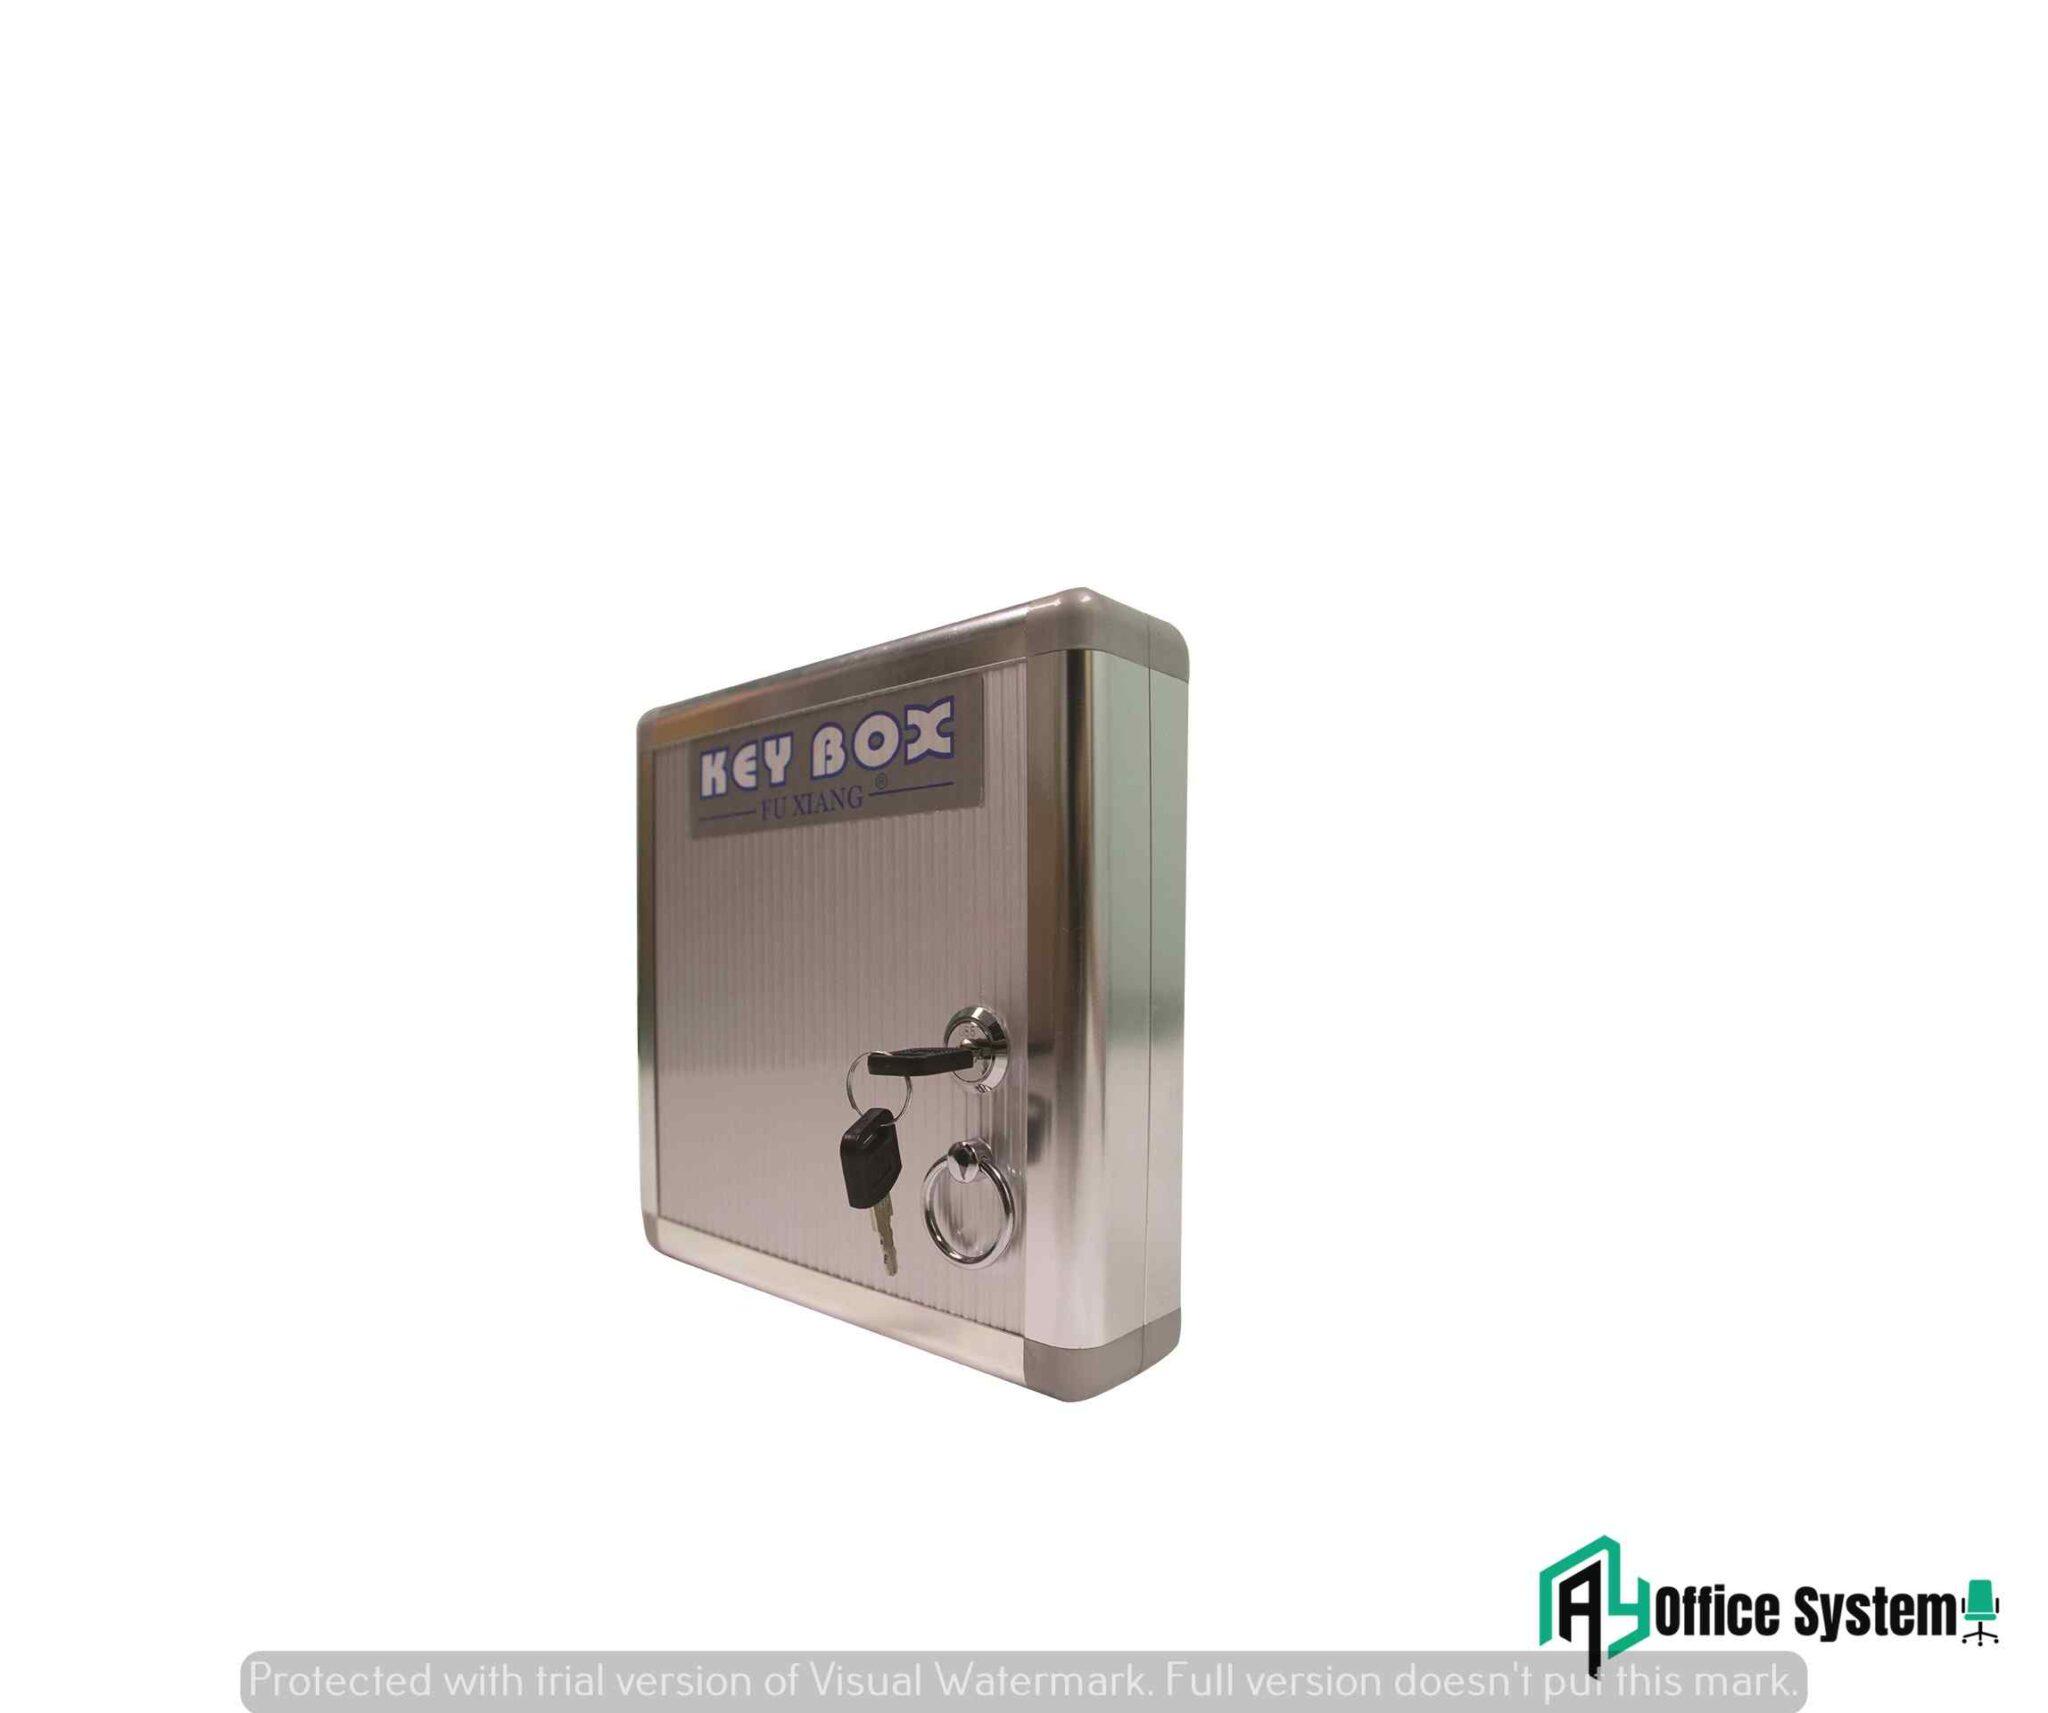 KB - Key Box AY Office System